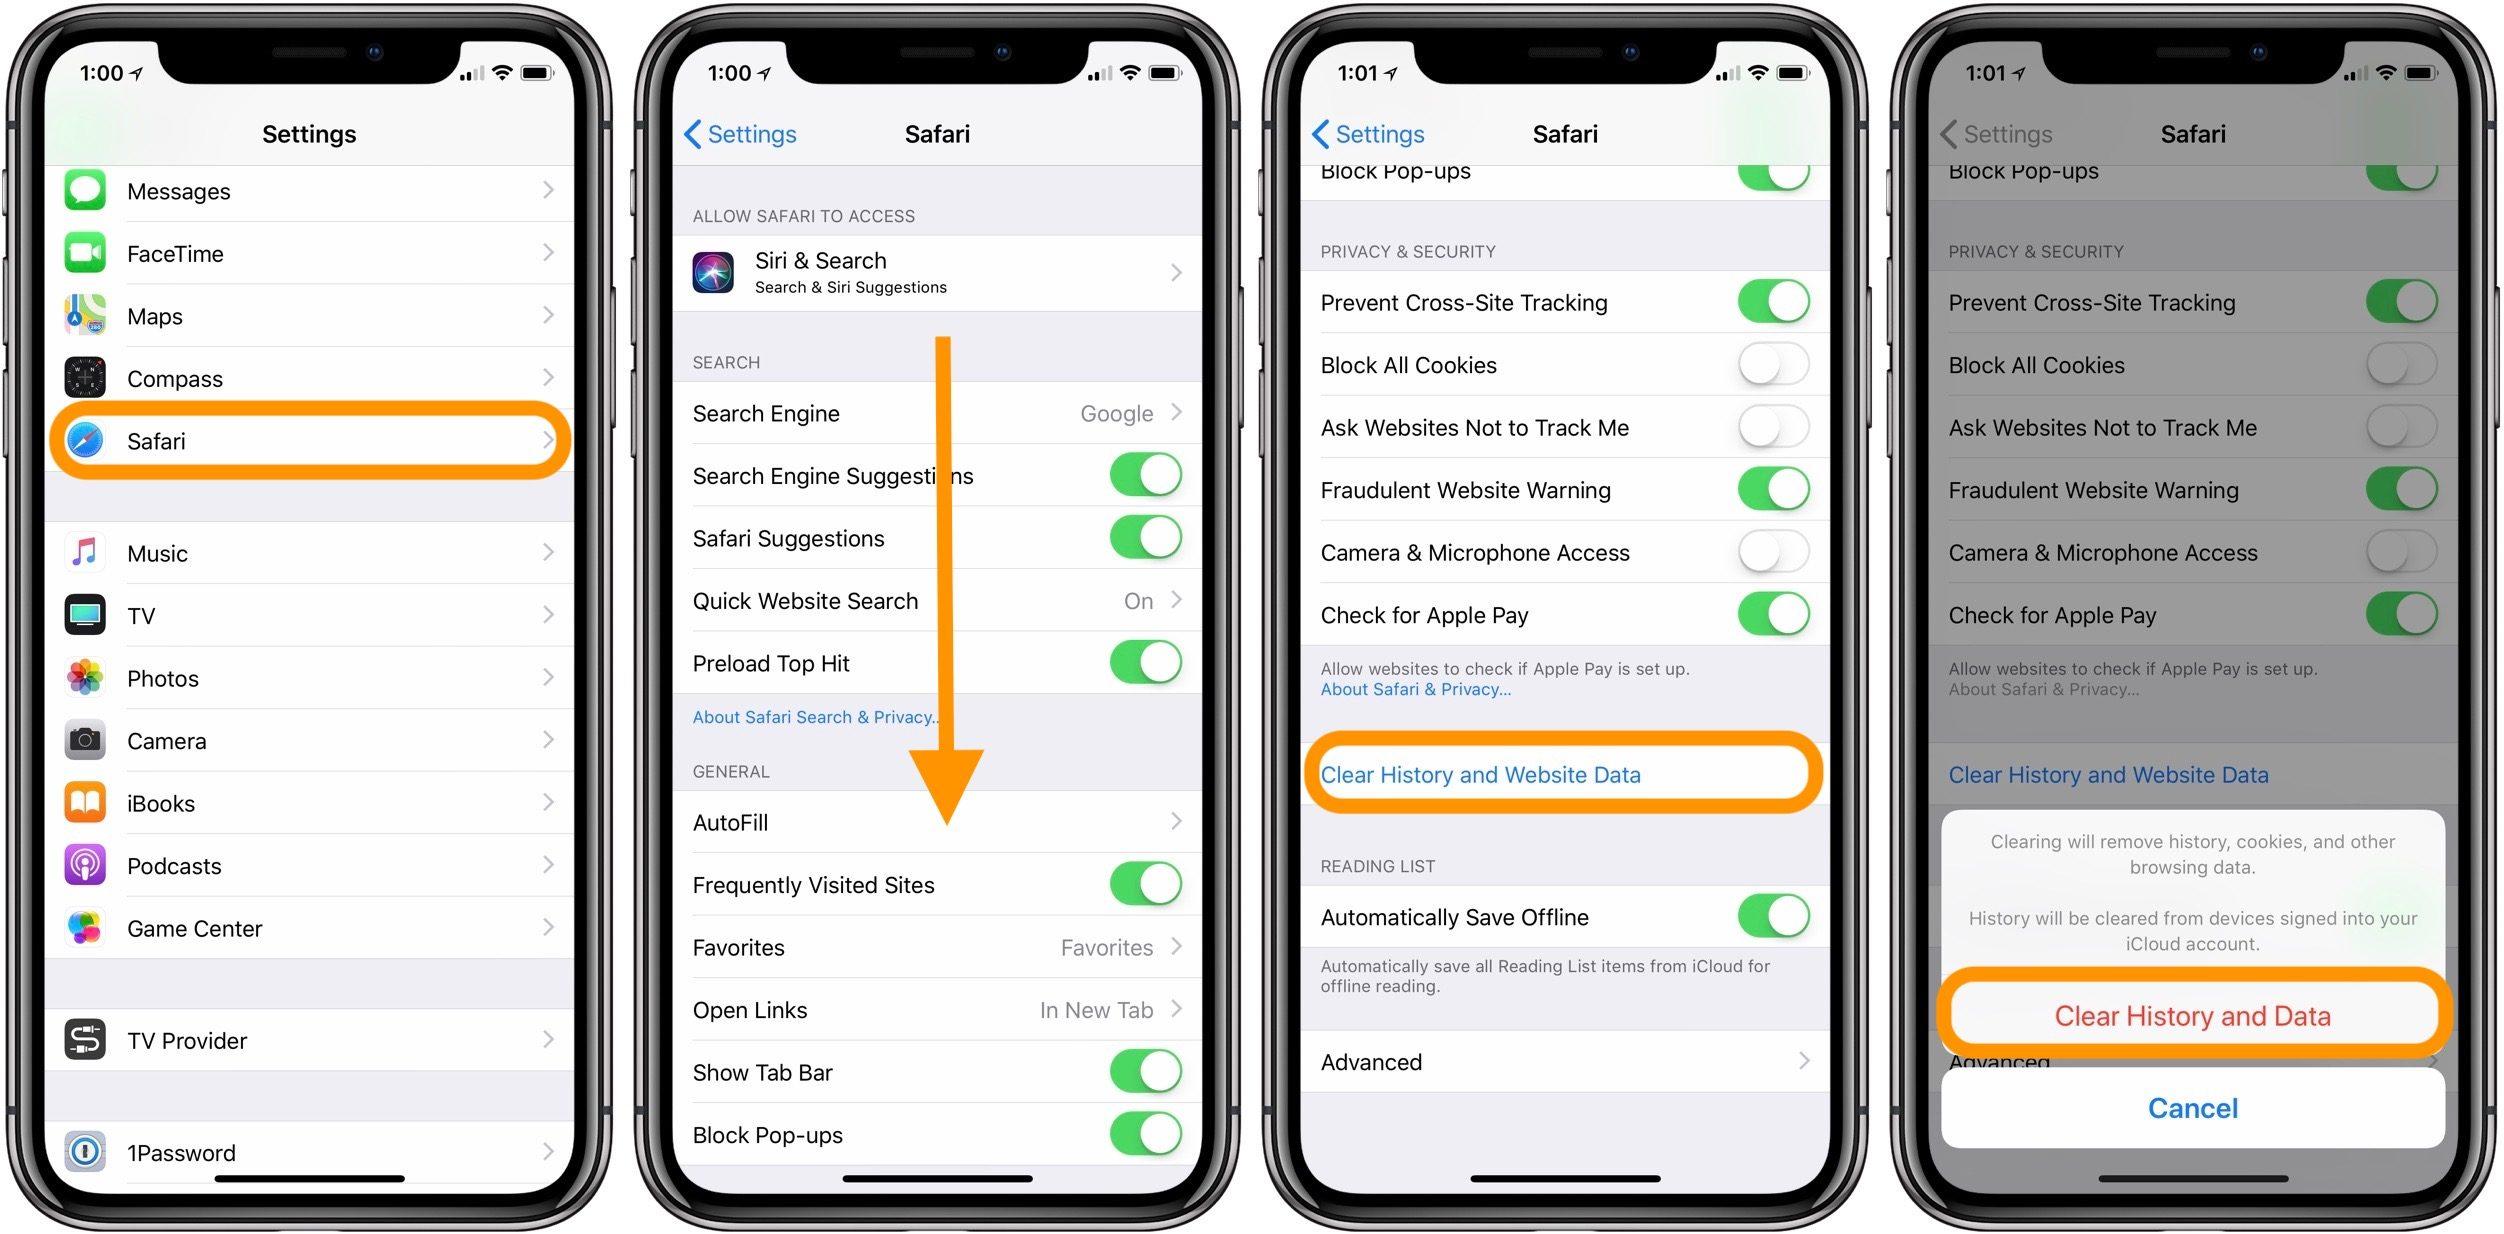 "<span href=""https://9to5mac.com/2018/05/24/iphone-ipad-how-to-clear-cache/"">iPhone & iPad: Cómo borrar la caché</a>"